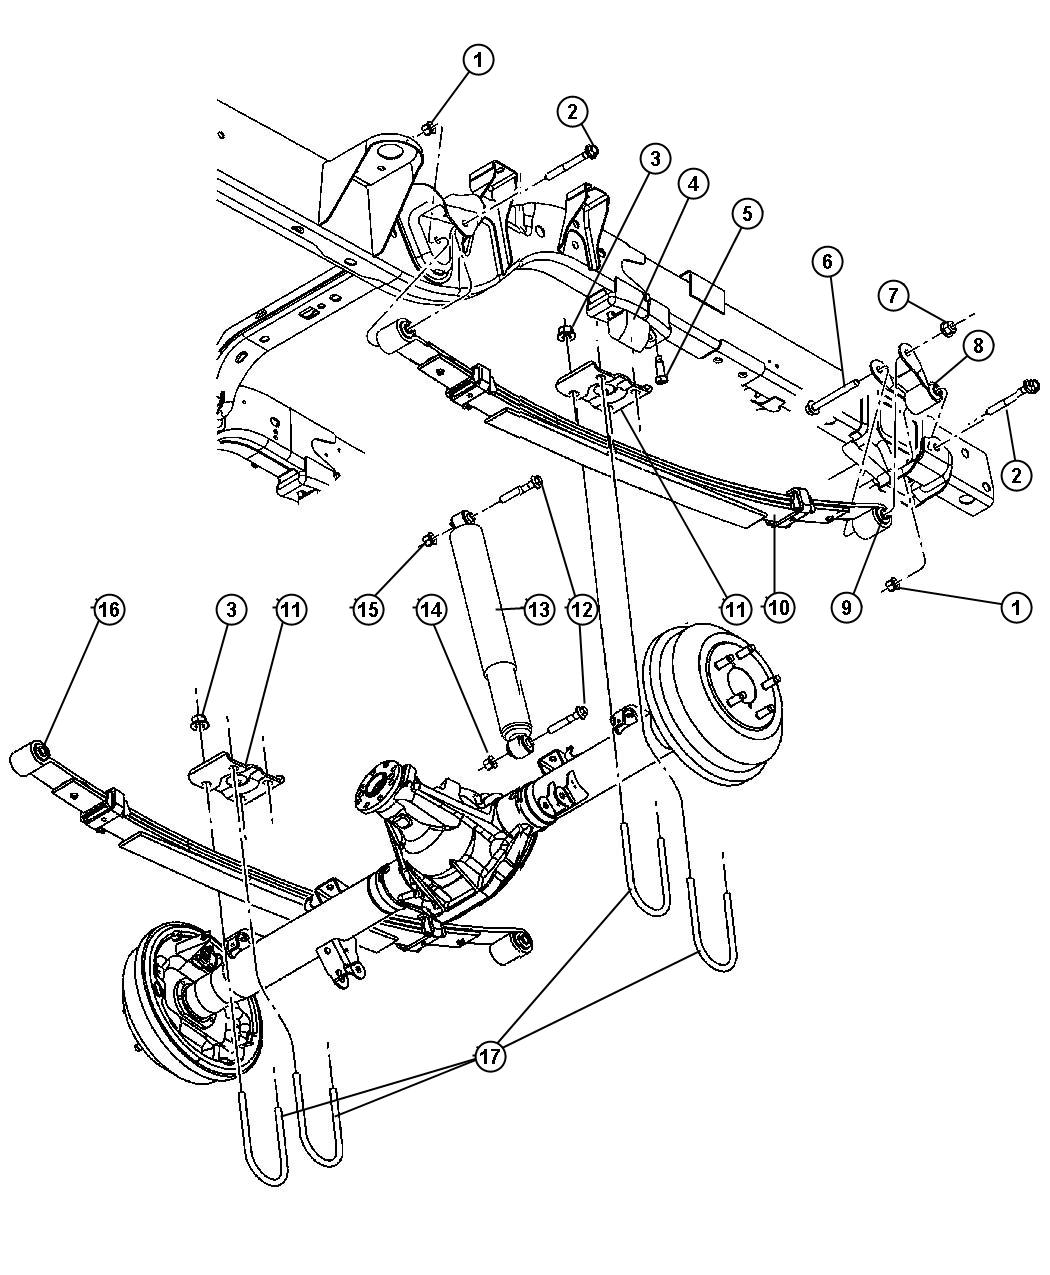 Toyota Rear Suspension Noise